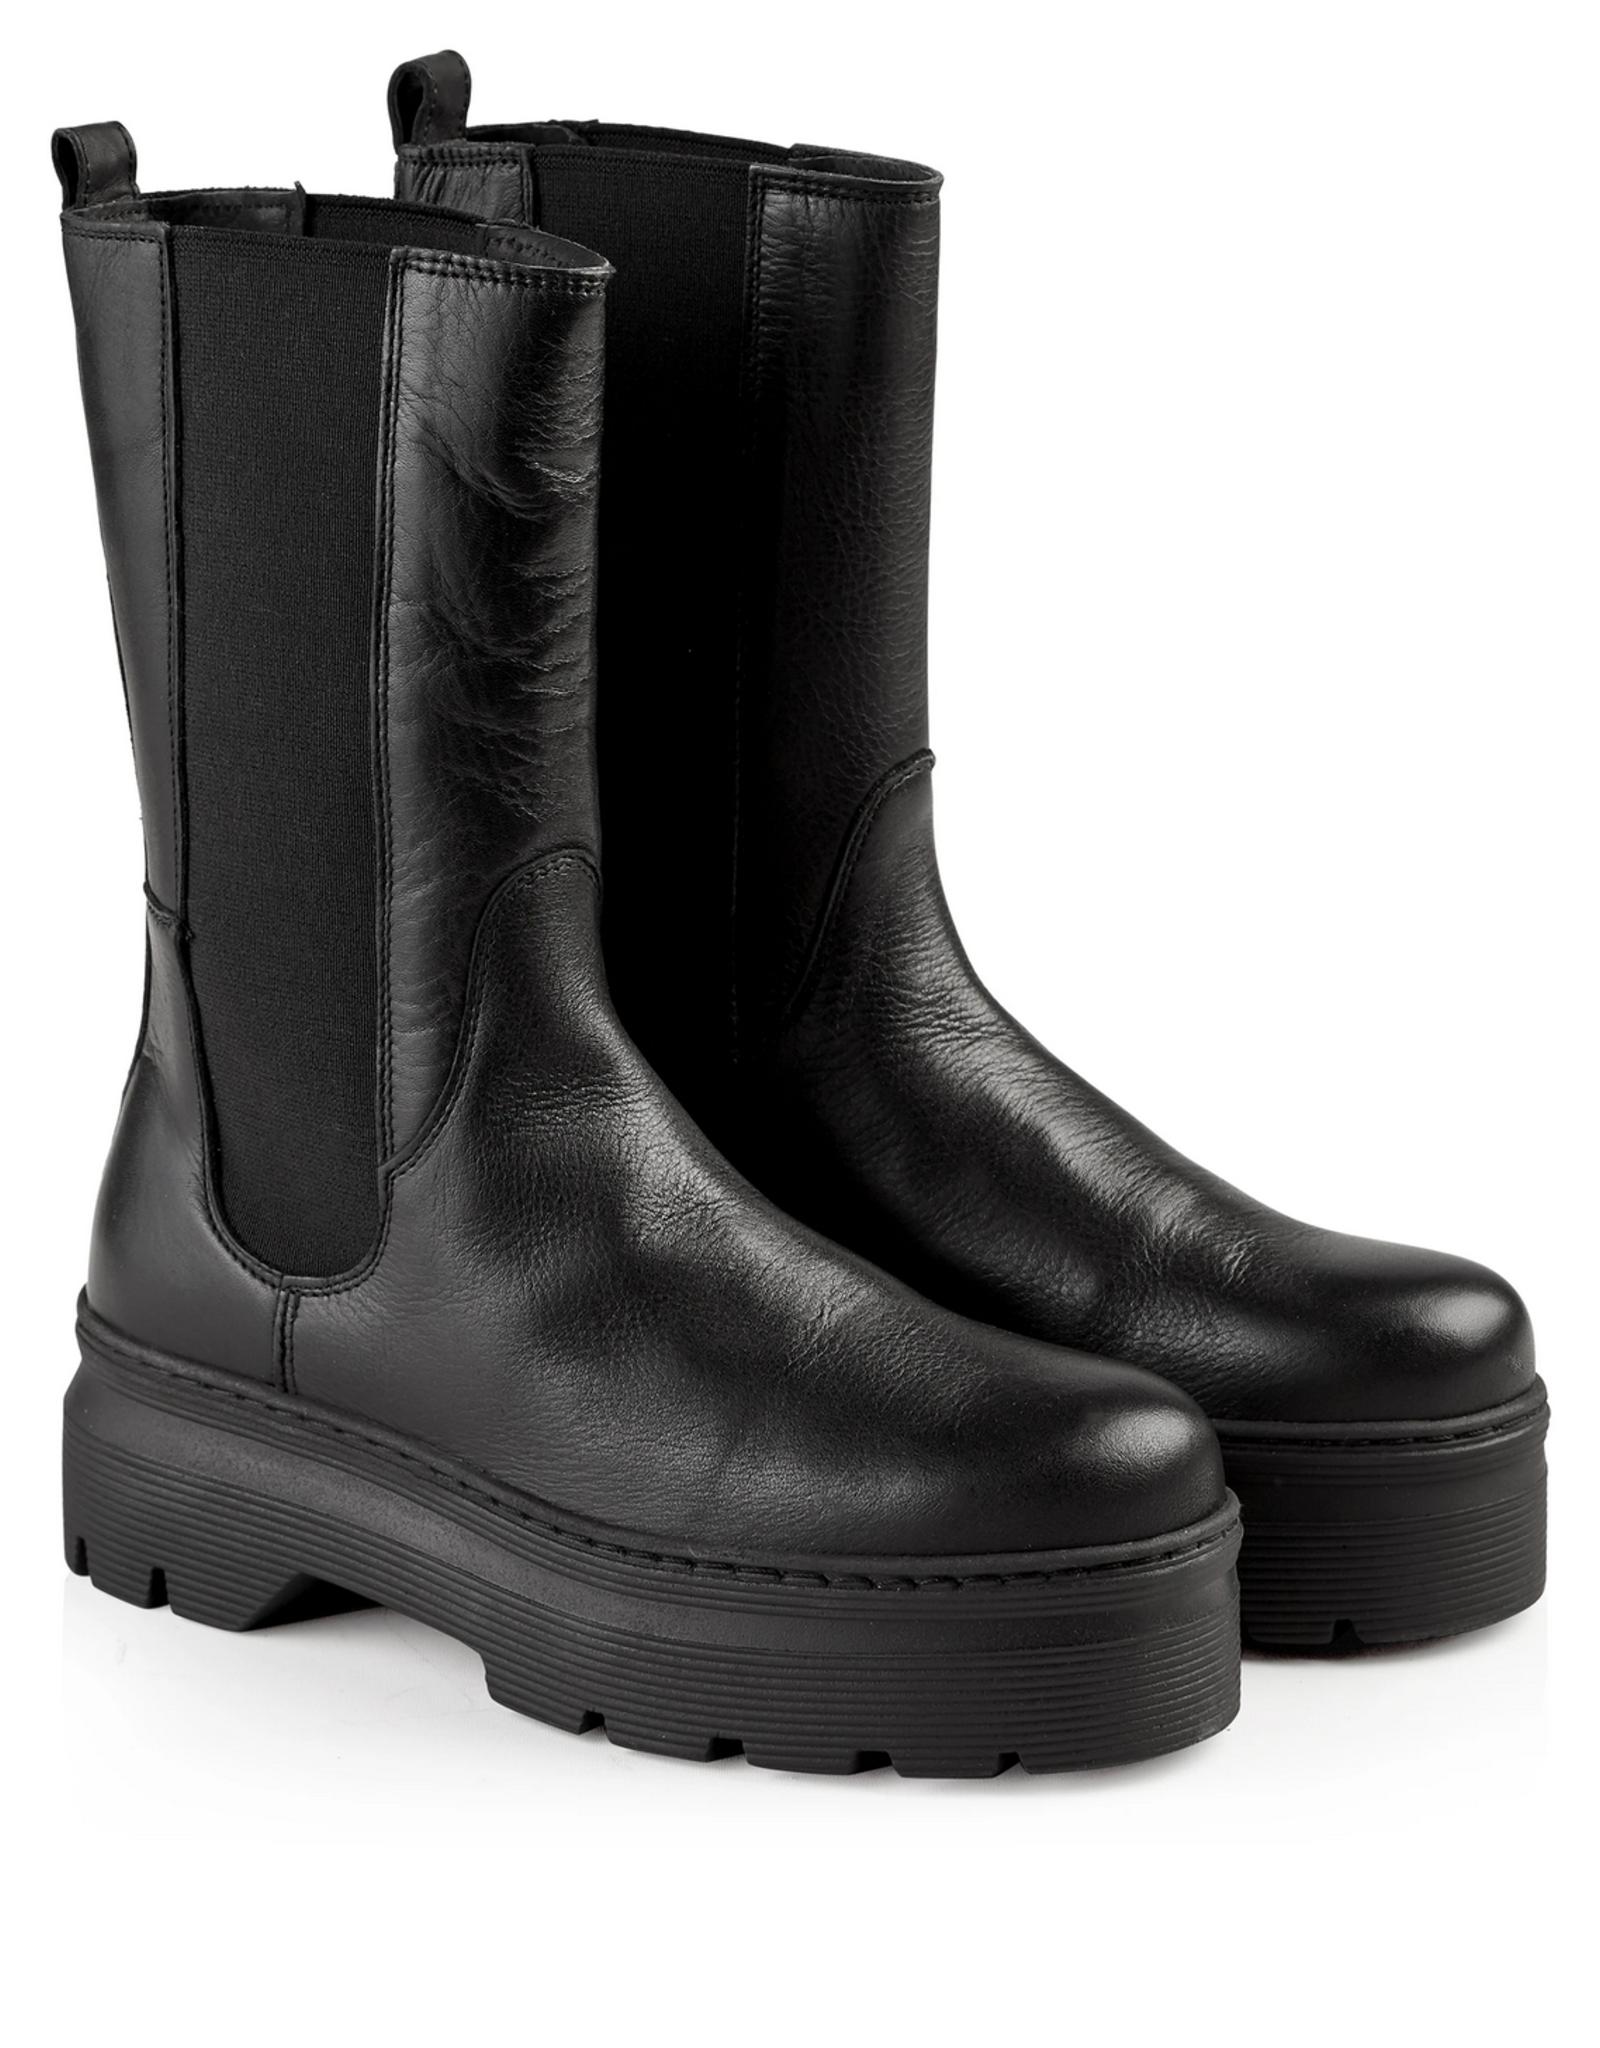 Pavement Aya leather black